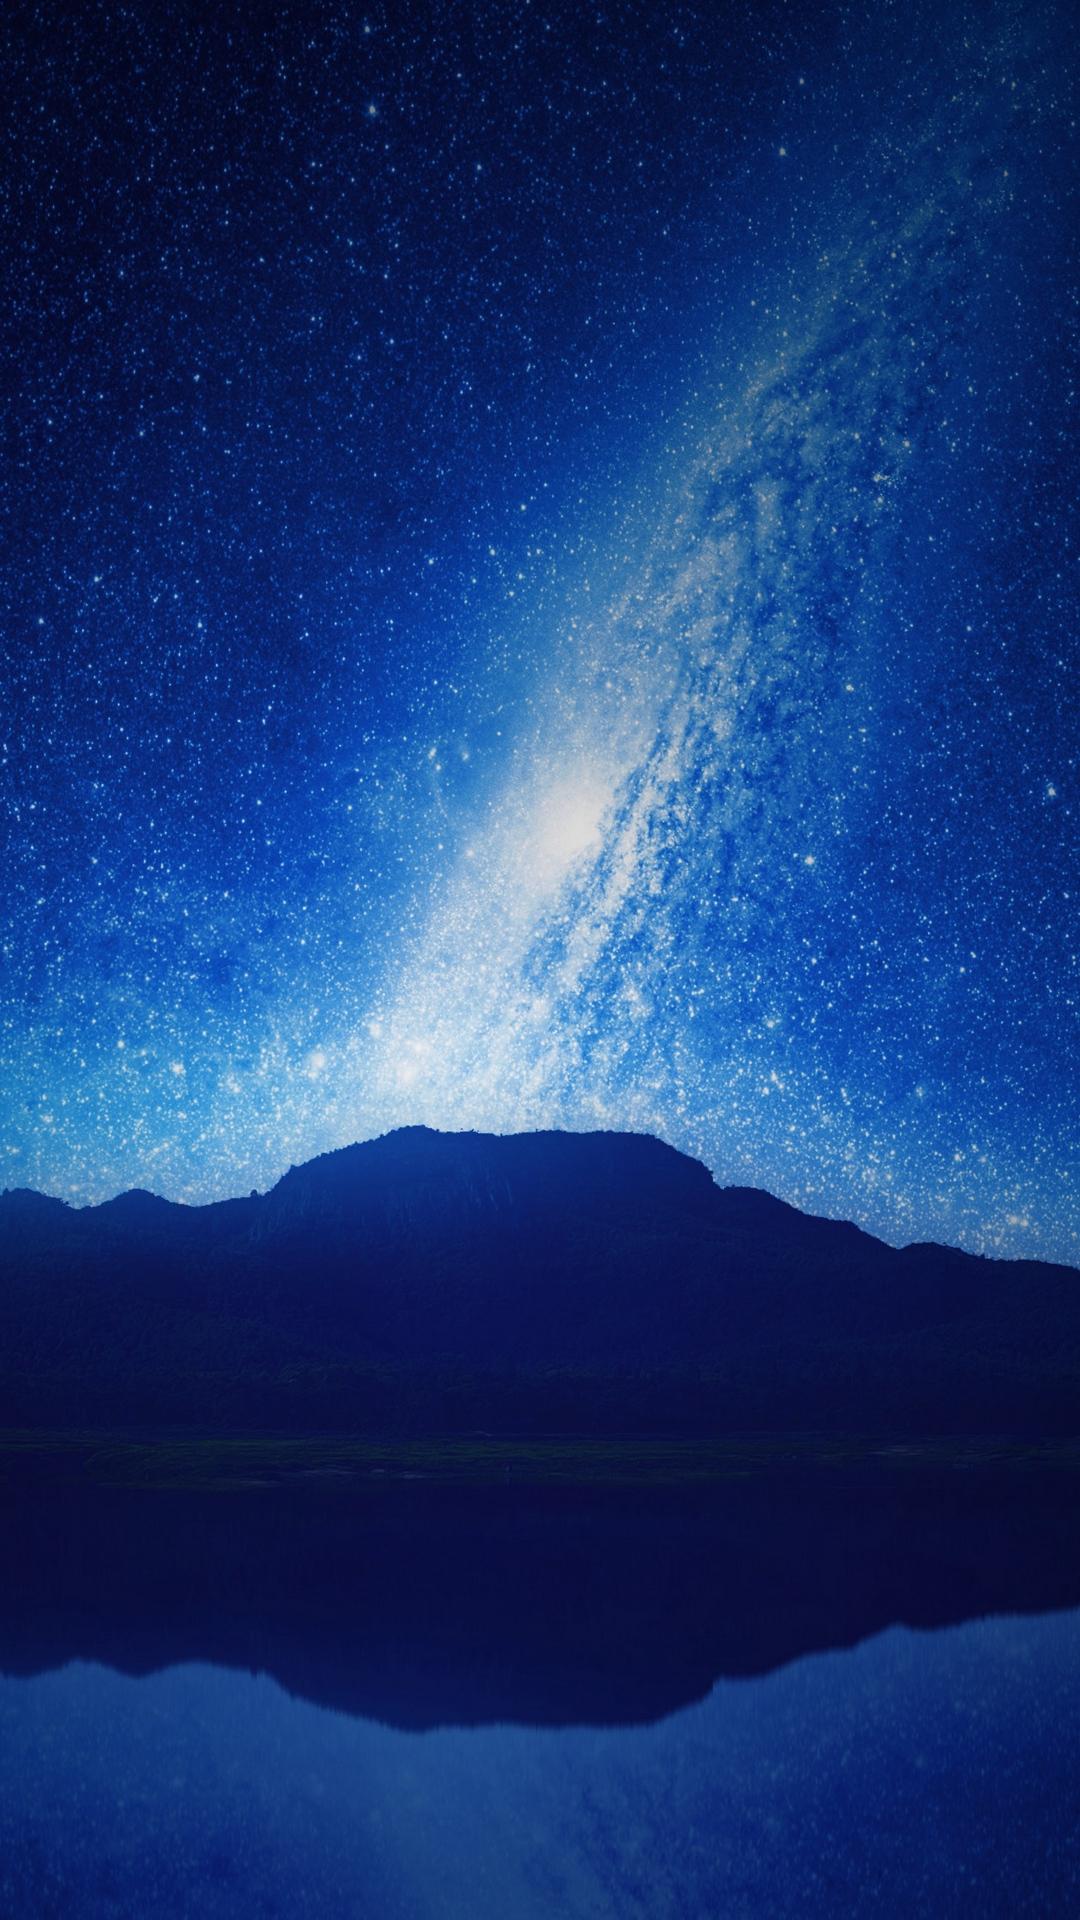 space moon sky milkyway astronomy daylight galaxy dark stars